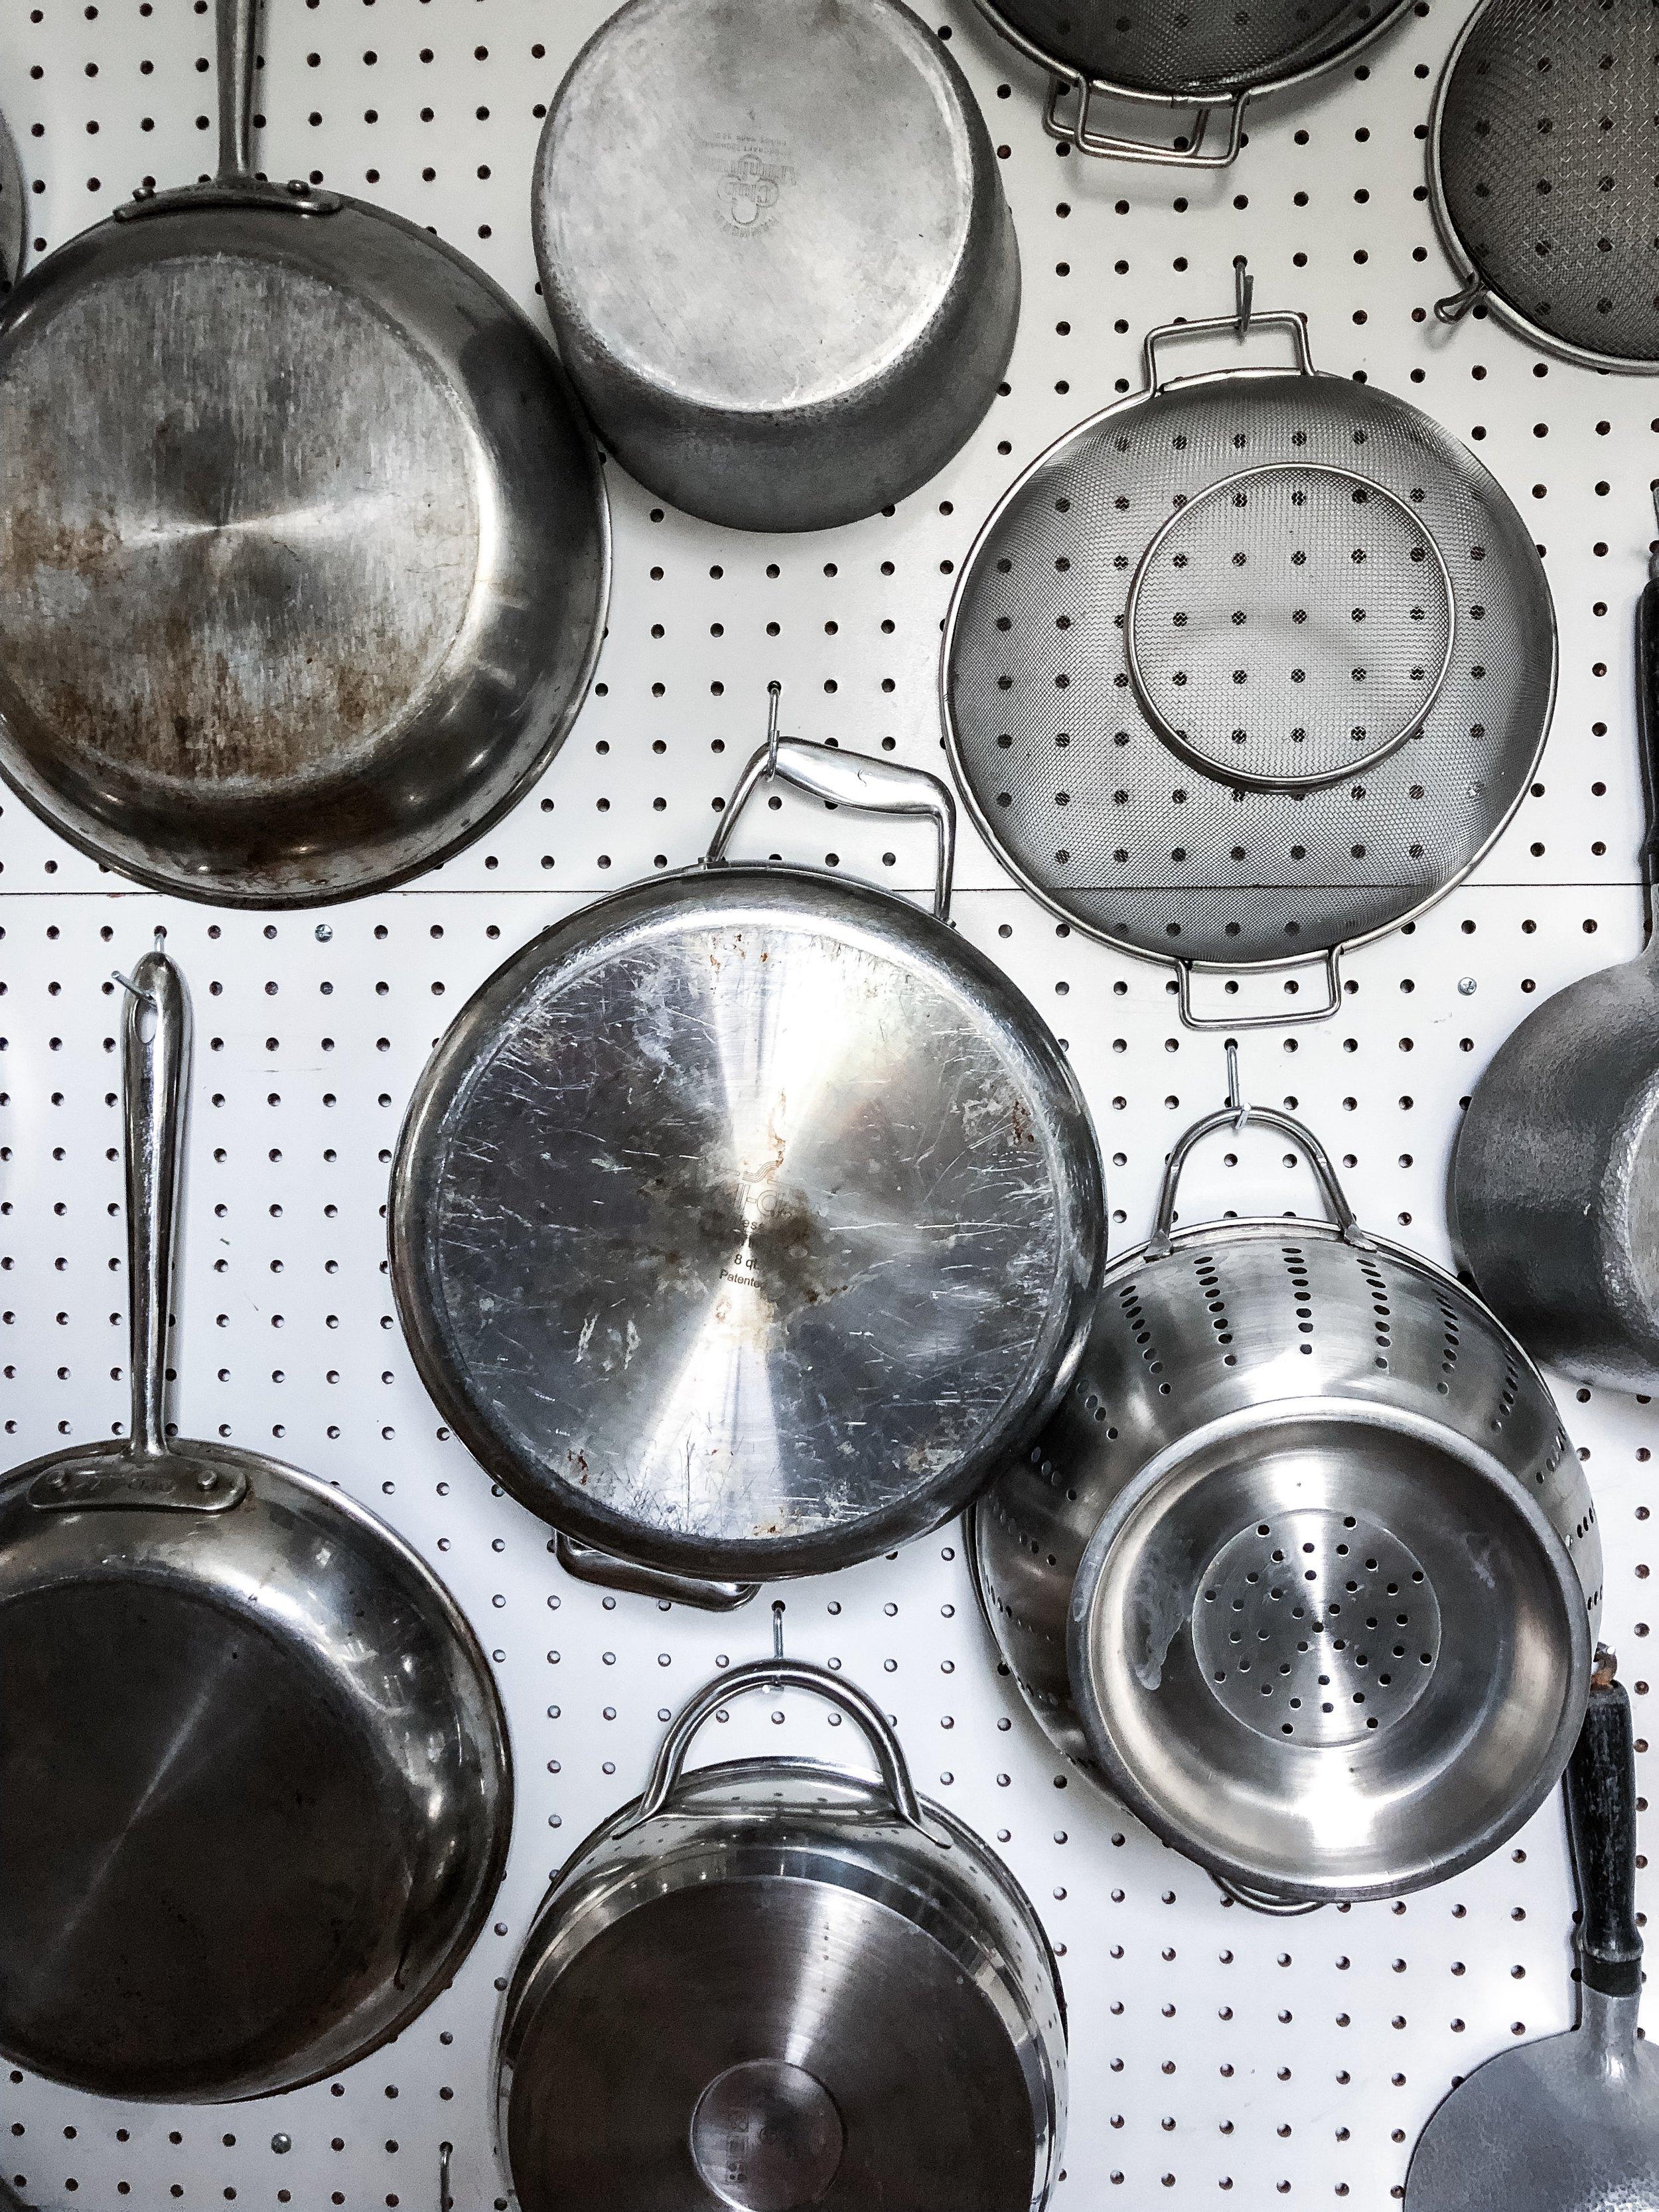 KitchenPegBoardBaileyRaesKitchen2.JPG